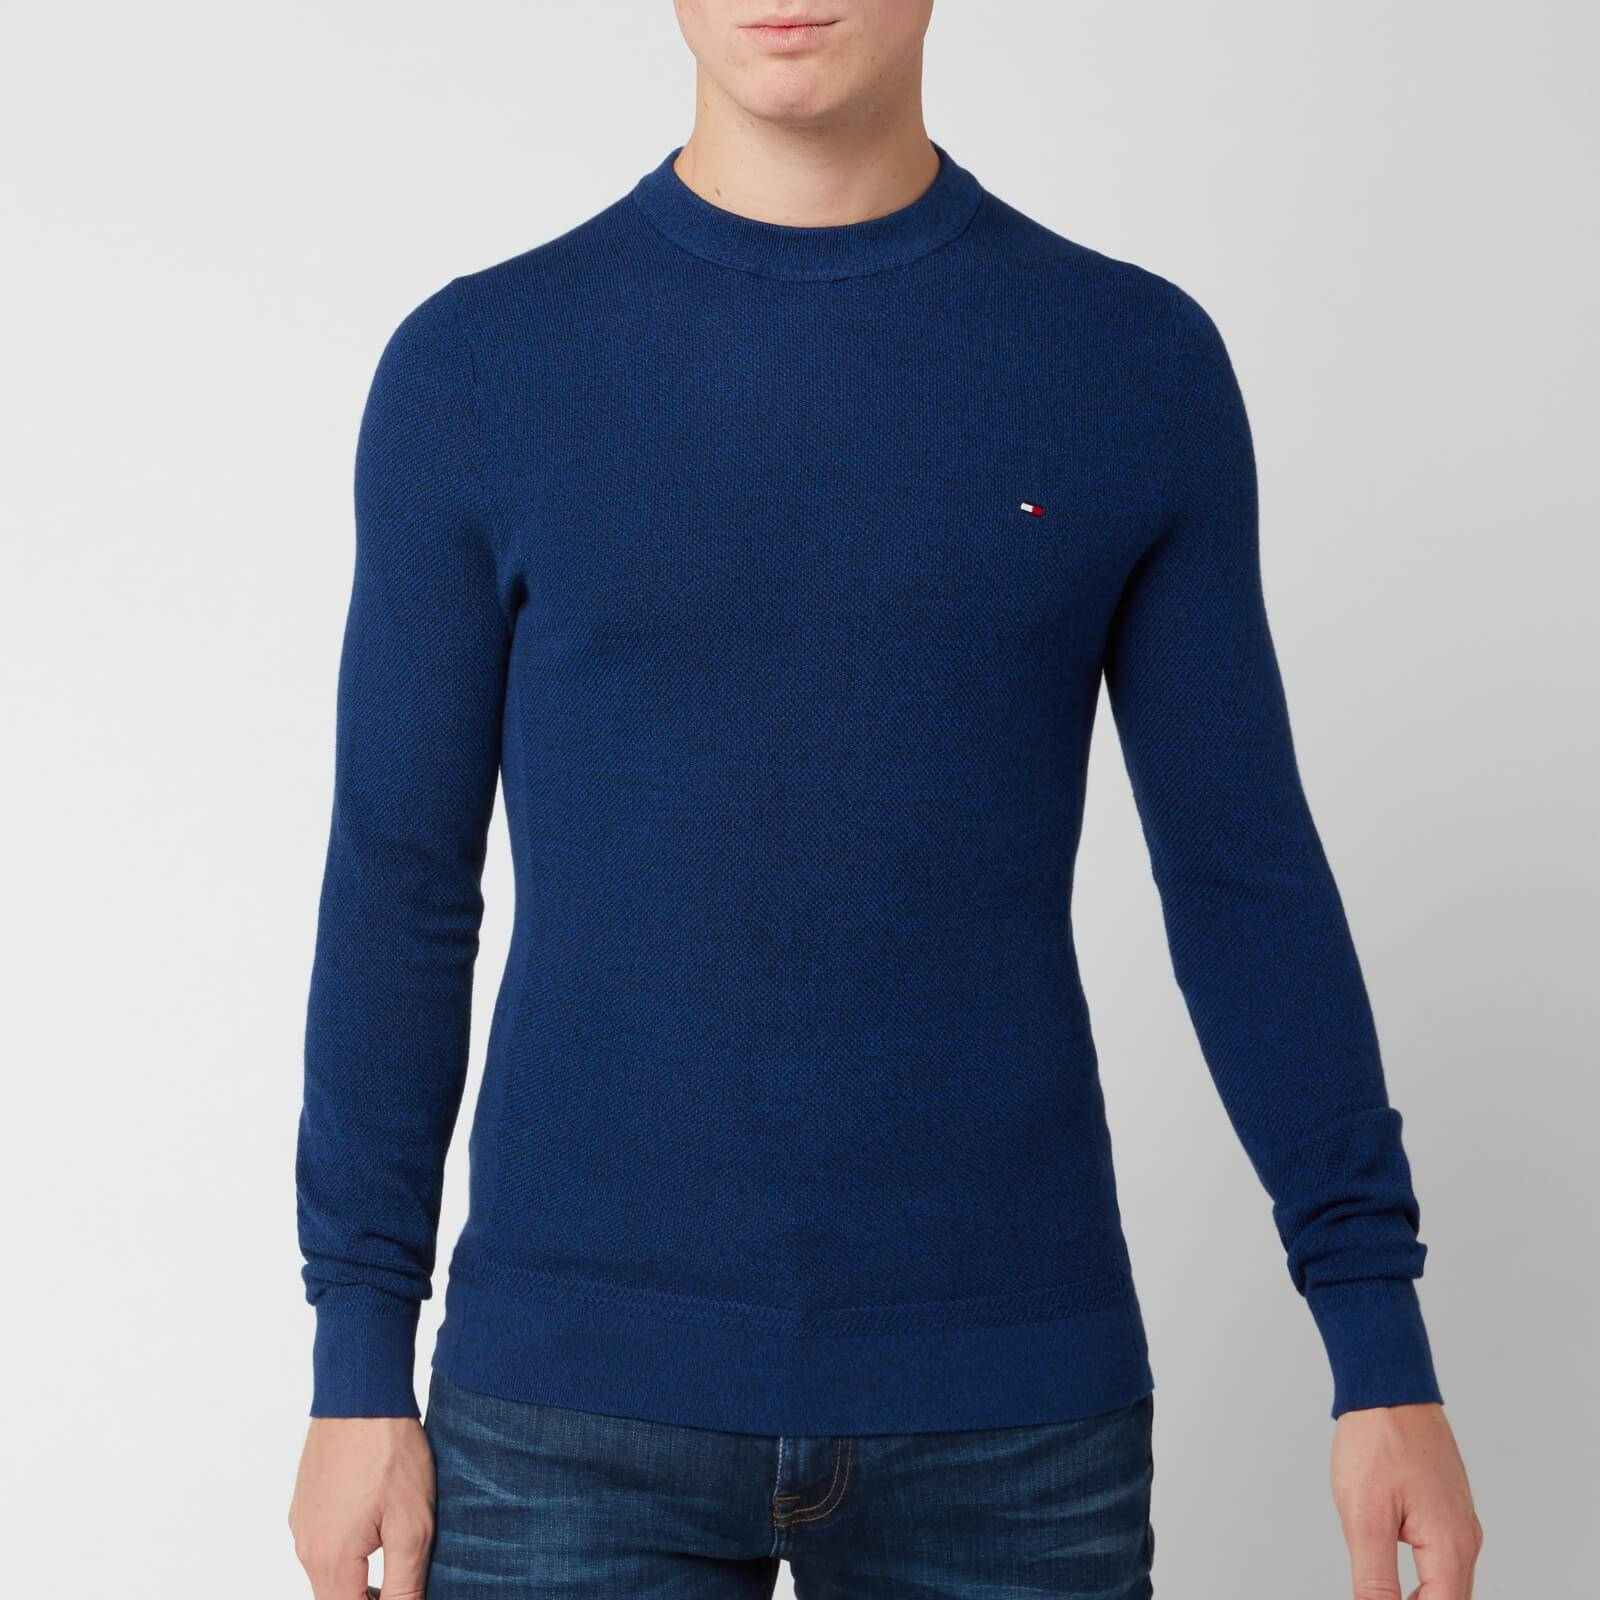 Tommy Hilfiger Men's Mouline Ricecorn Jumper - Blue Quartz - M - Blue